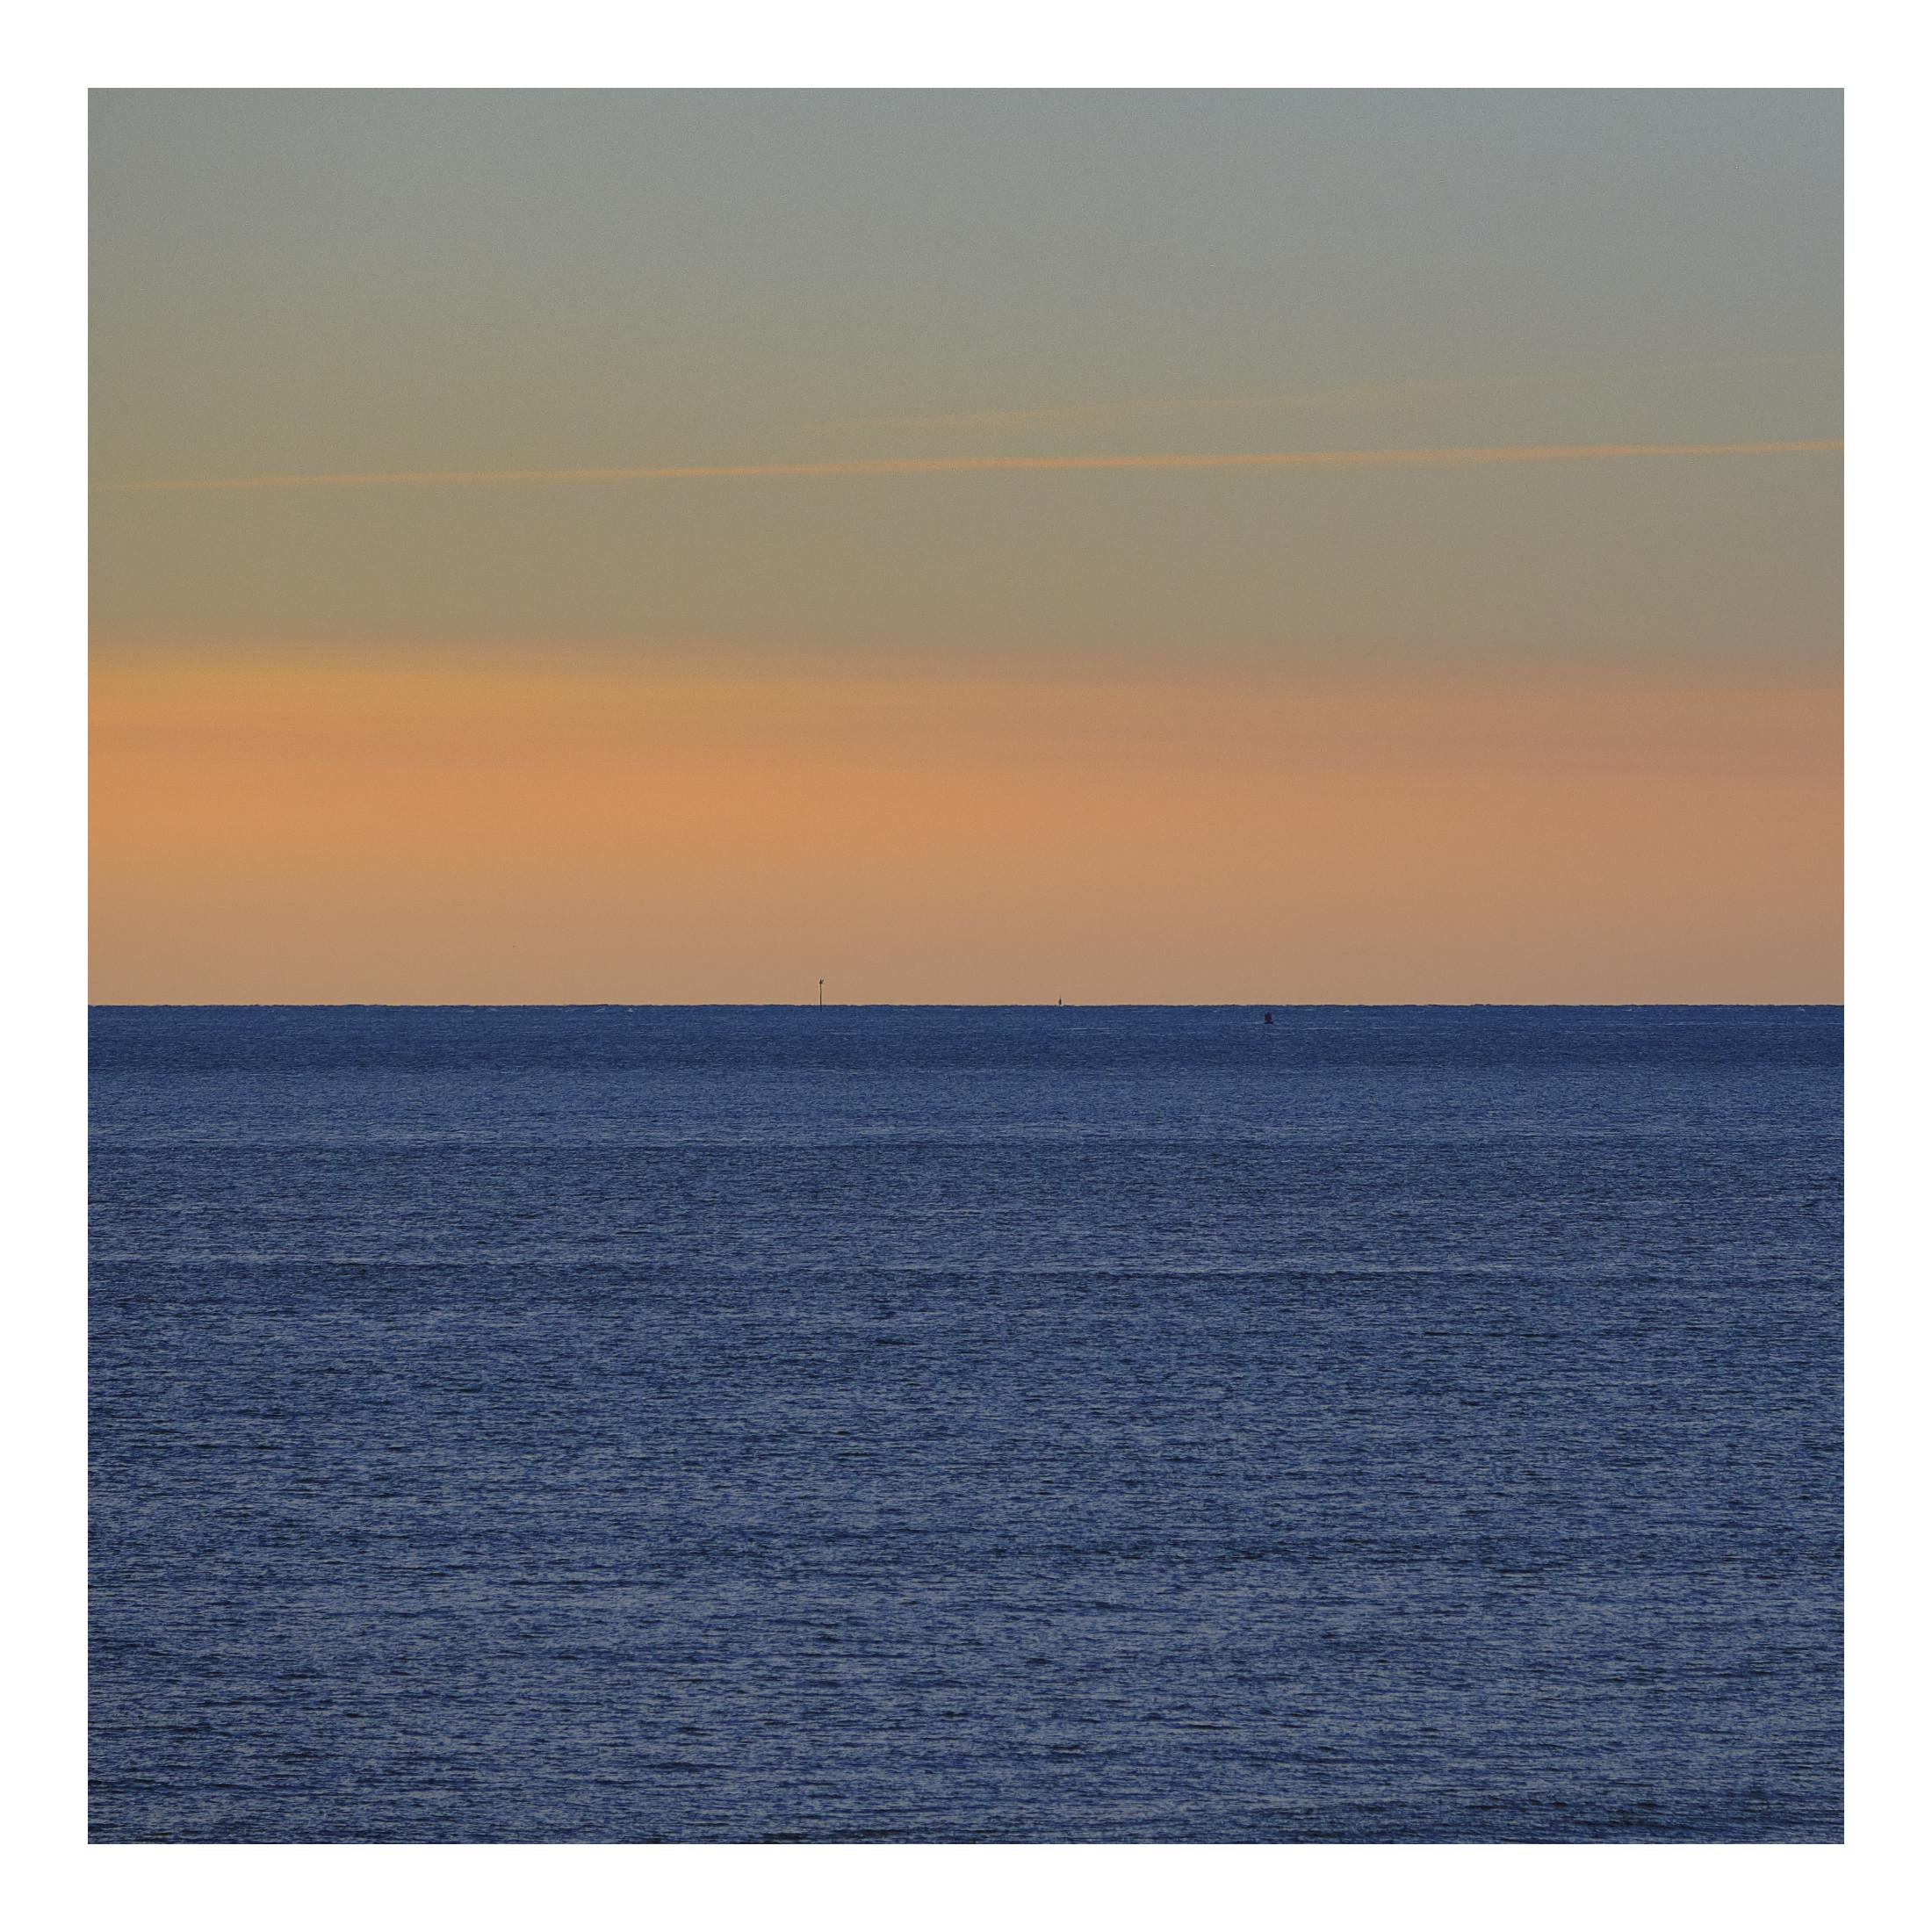 DSCF8429-layers.jpg